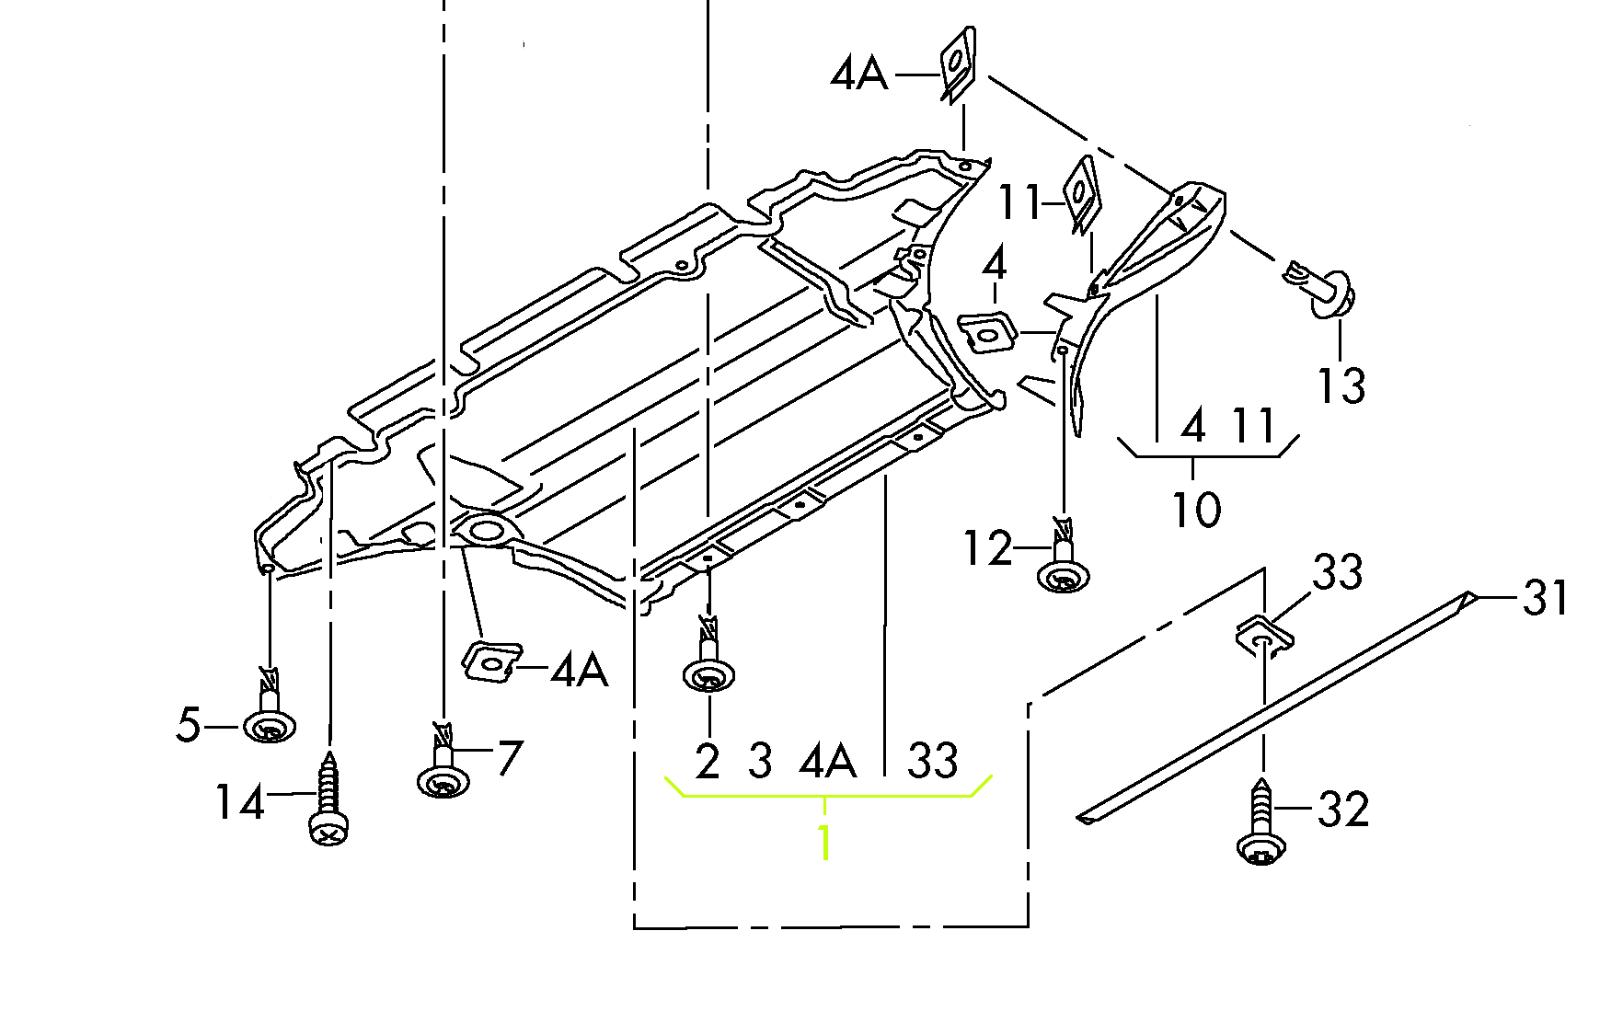 roger vivi ersaks: 2008 Audi A4 Engine Splash Shield Diagram